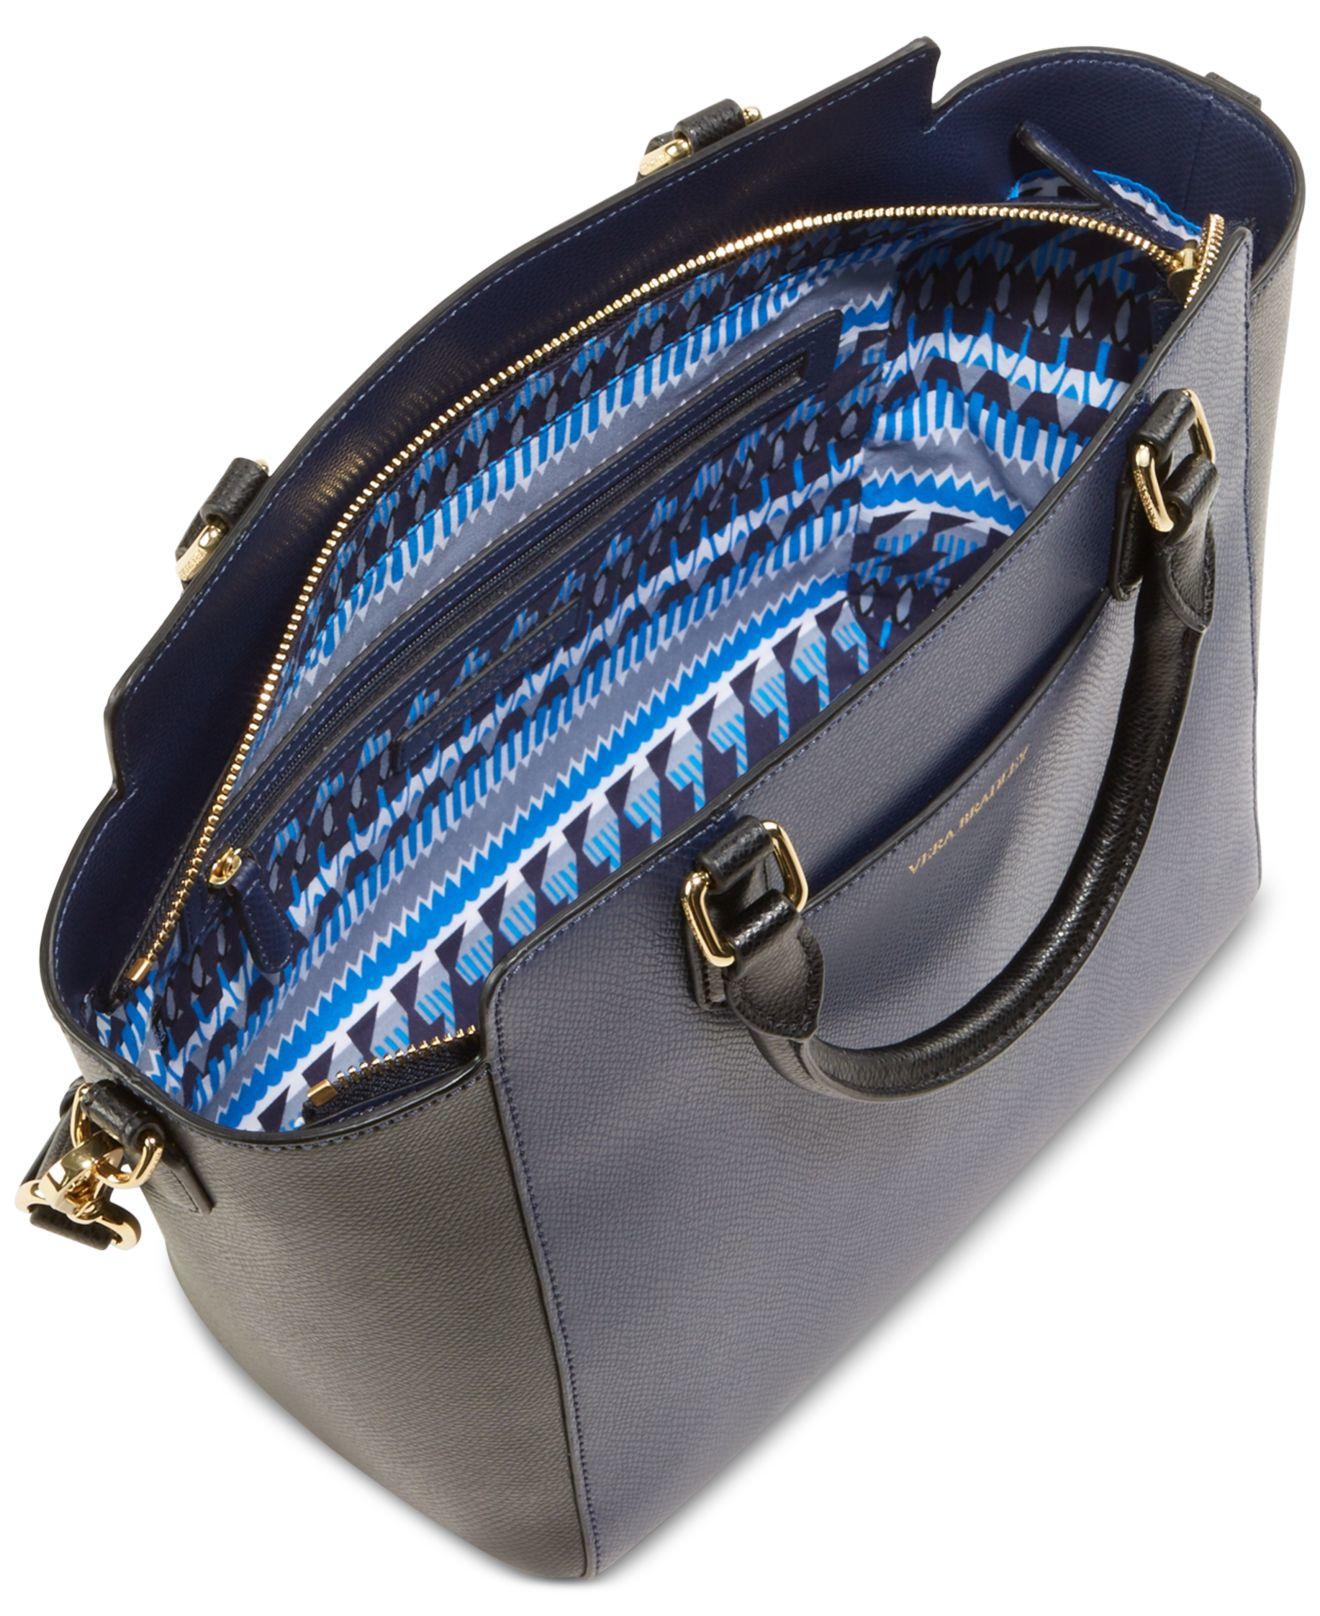 d19503d2ee Vera Bradley Blue Leather Purse - Collections Blue Images